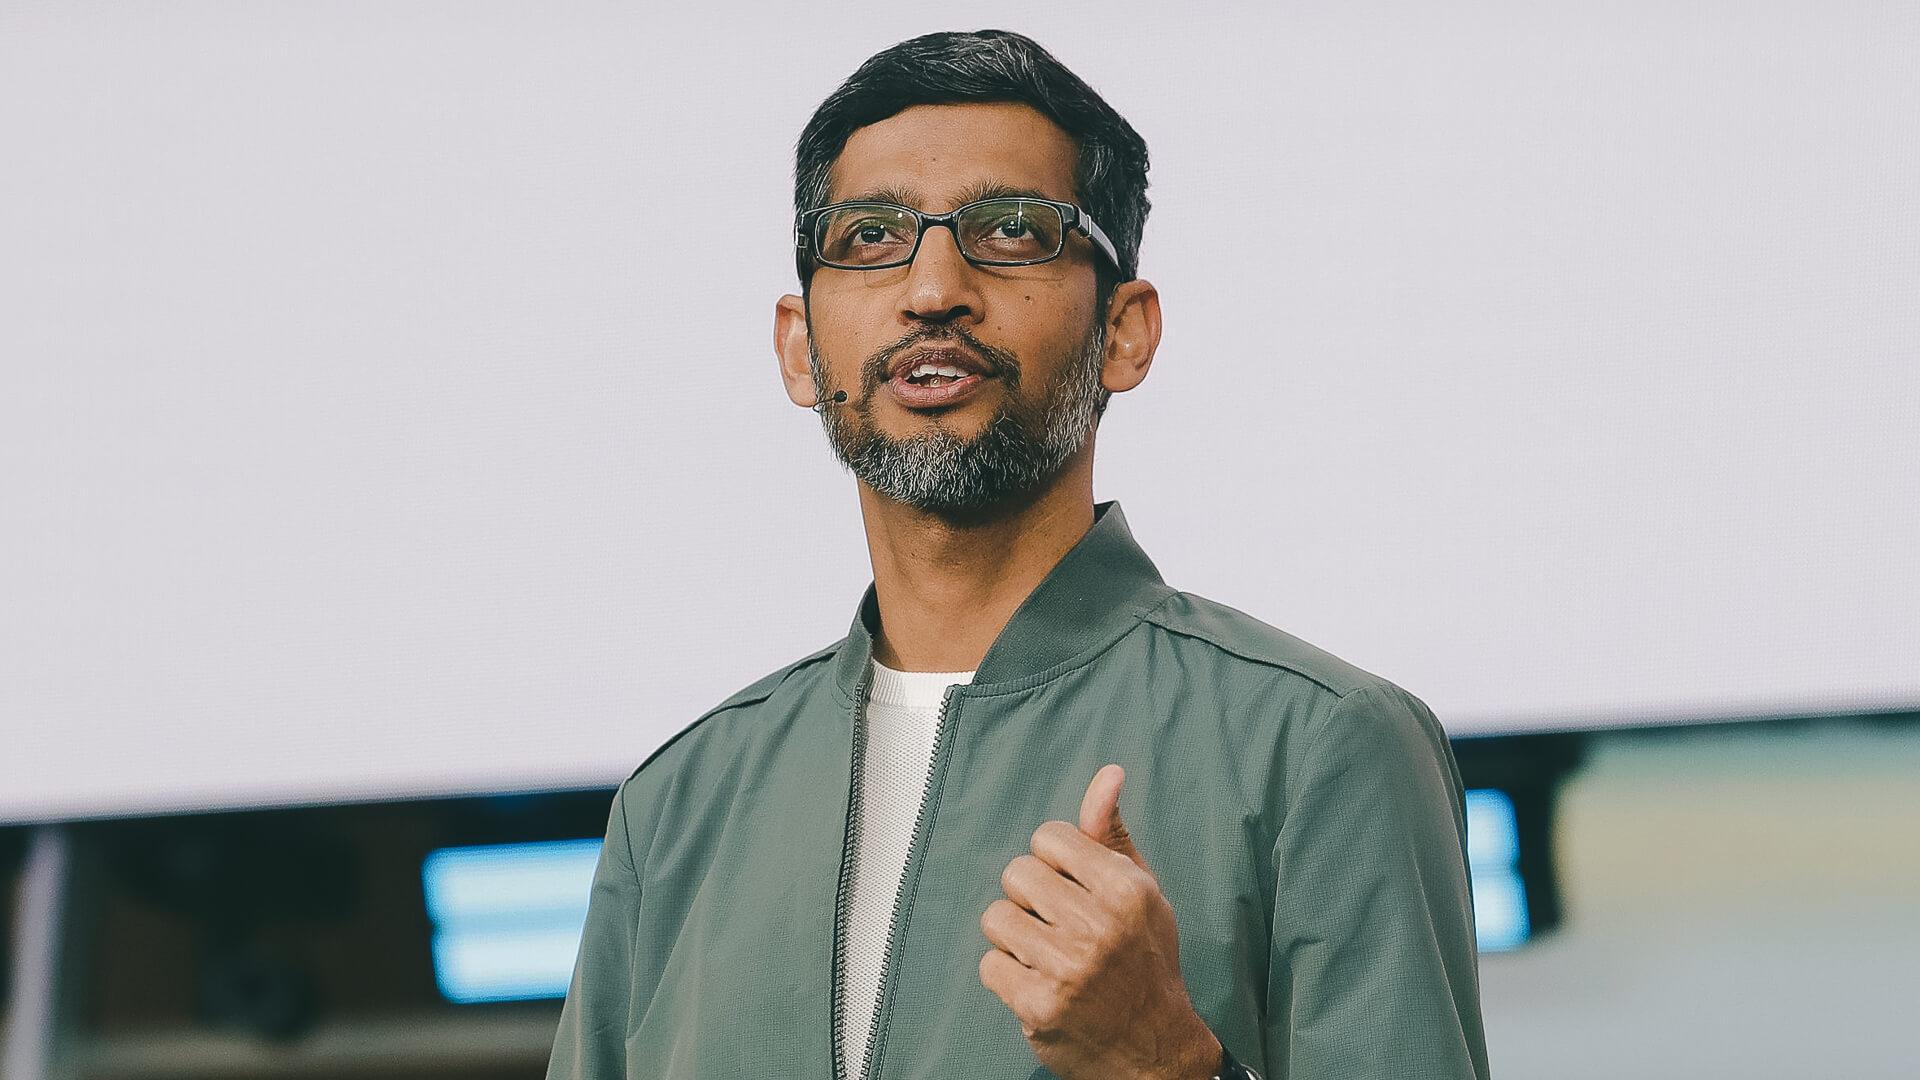 Alphabet CEO Sundar Pichai's Net Worth: What the Chief of Google Earns